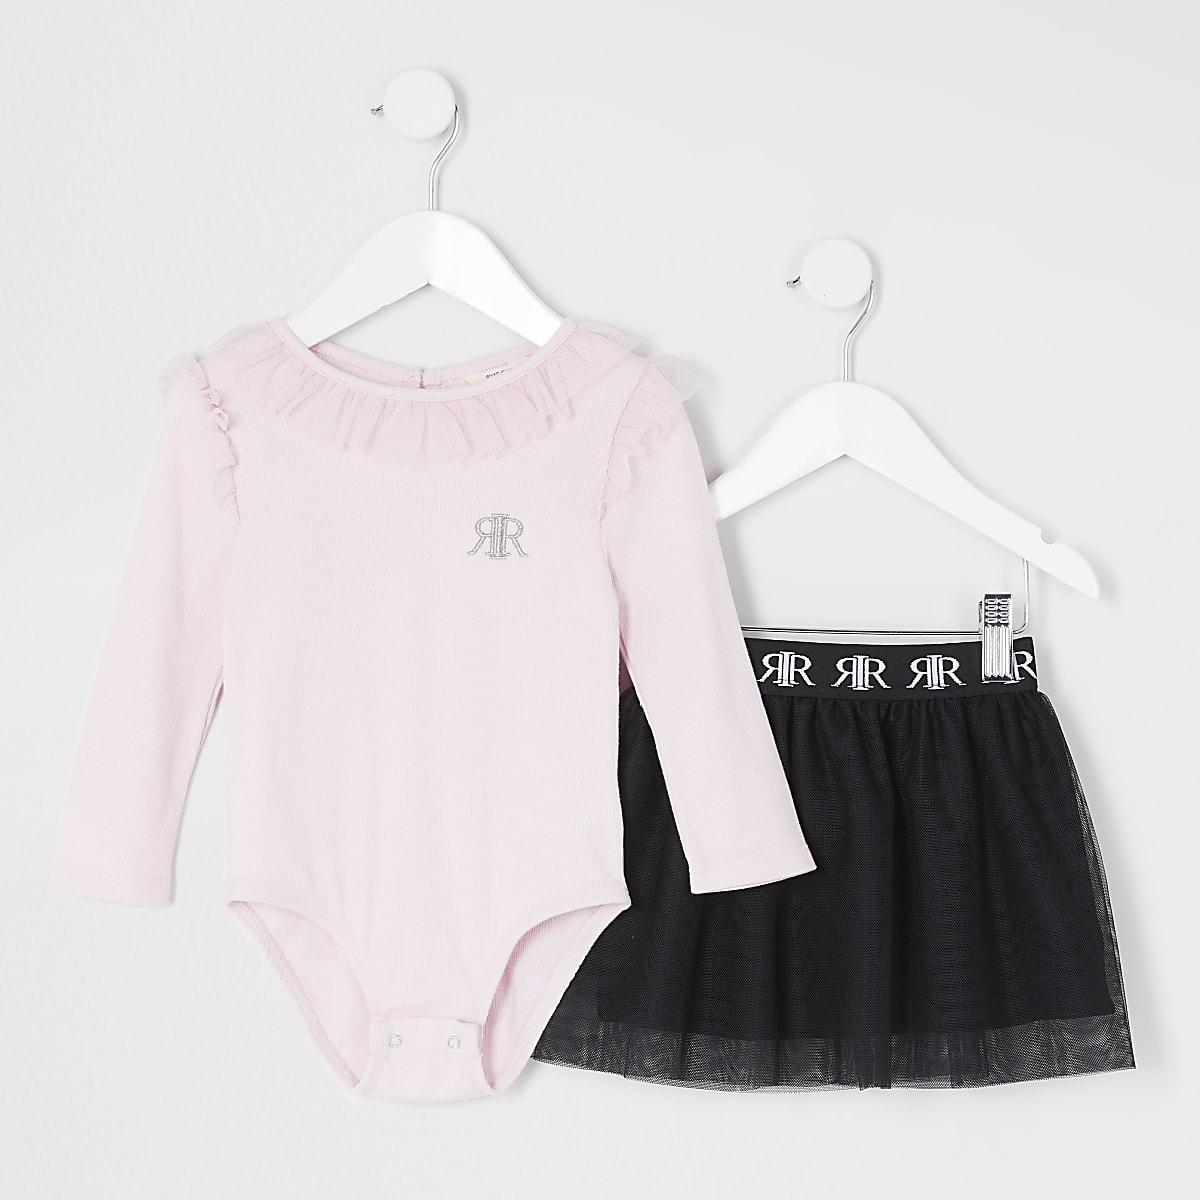 Mini - Roze bodysuit tutu outfit met ruches voor meisjes